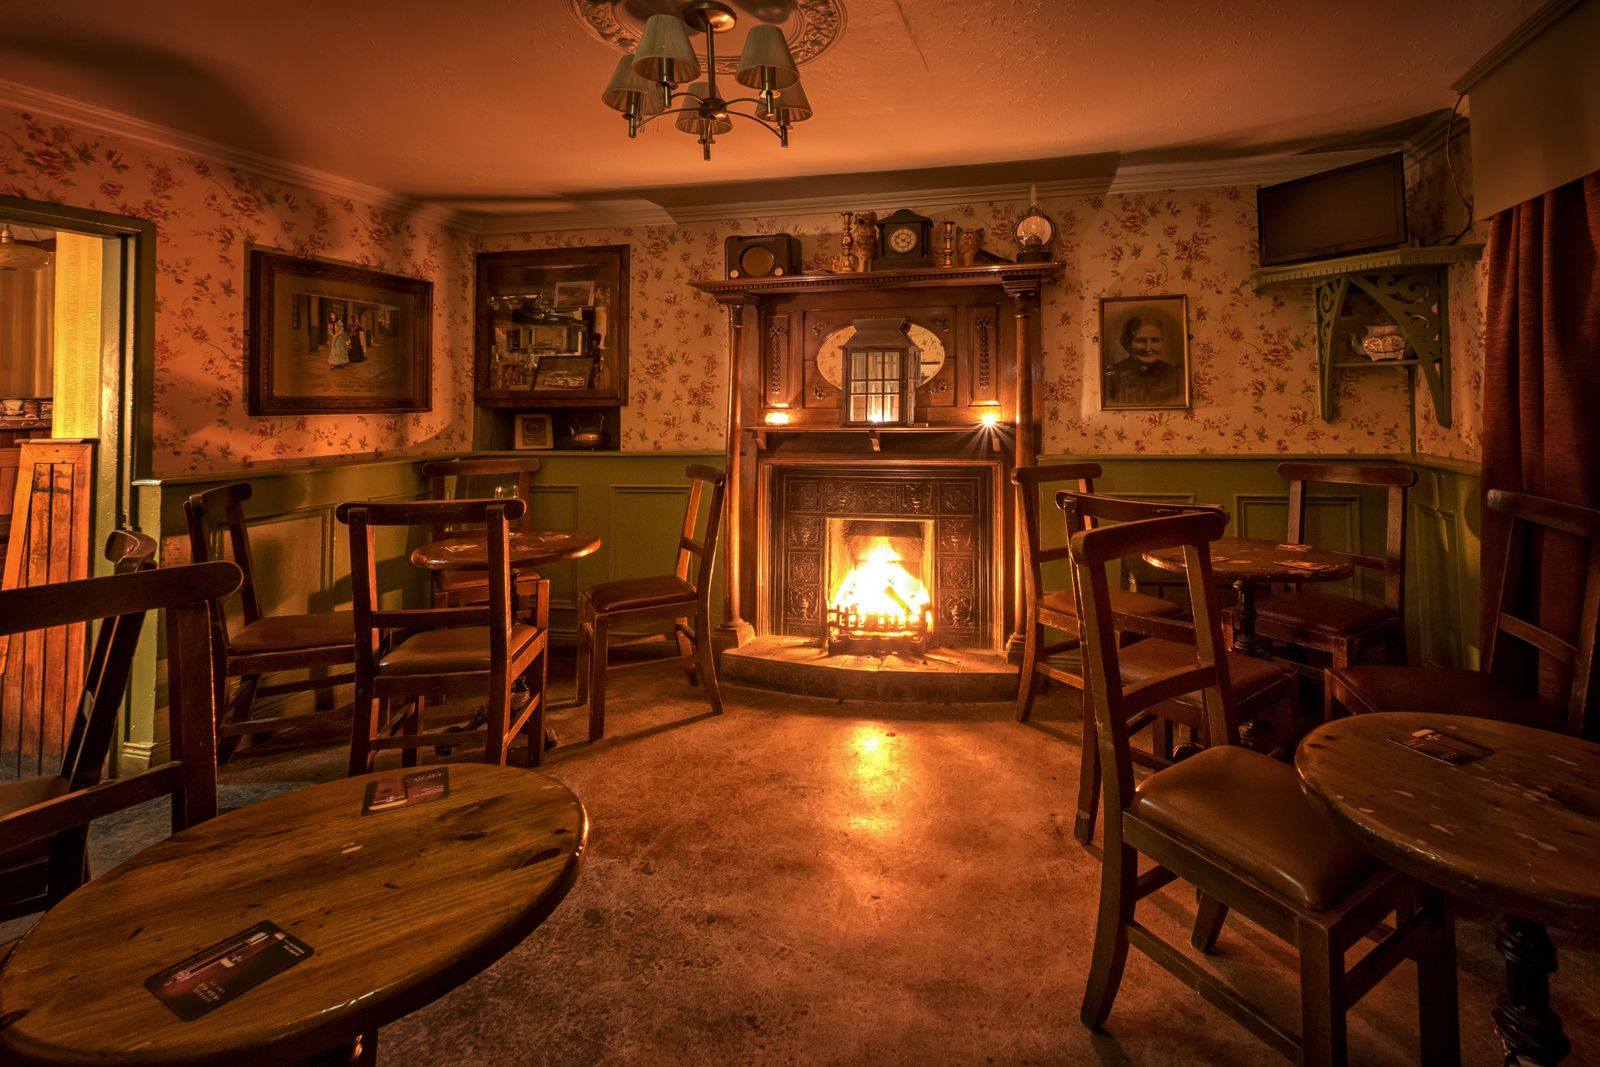 The Farmers Home Northern Ireland in 2020 Pub interior